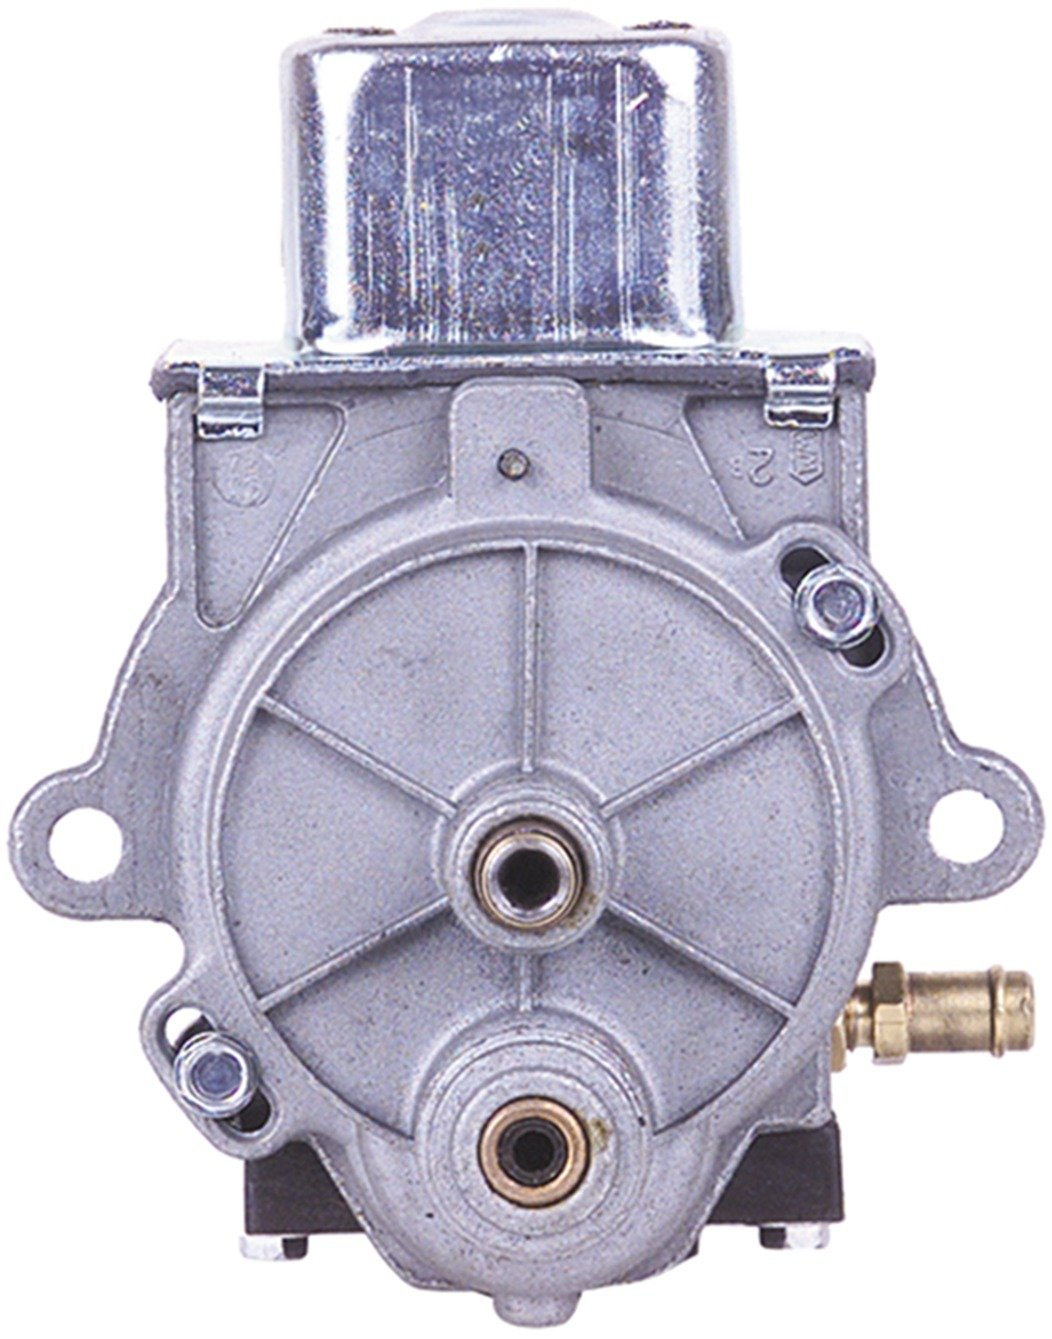 Cardone 36-102 Remanufactured Cruise Control Transducer A1 Cardone AA136102